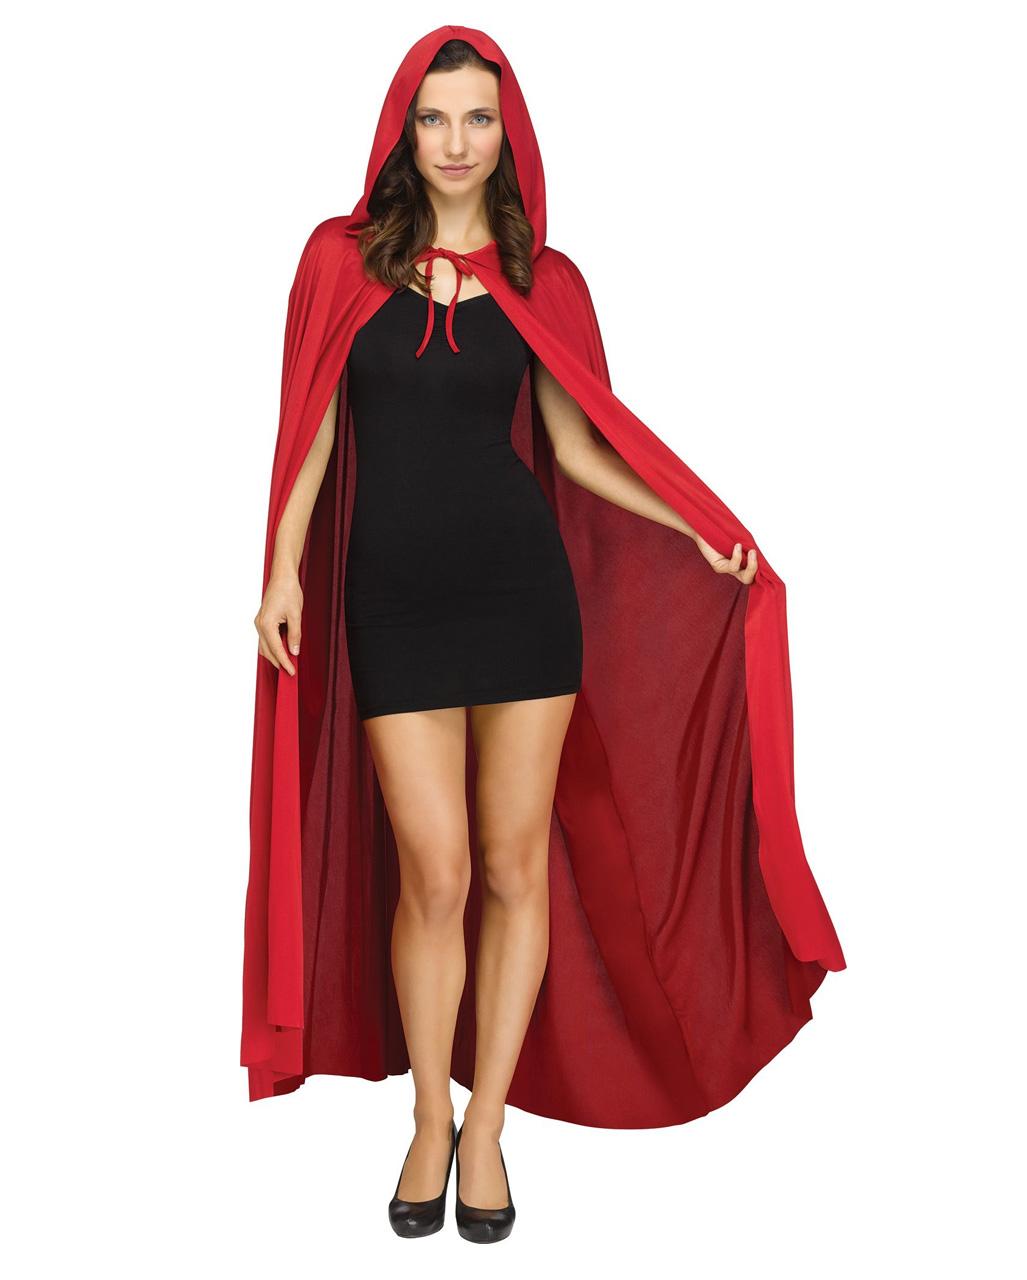 lang Cosplay-Kost/üm Bestgift Unisex Umhang mit Kapuze f/ür Halloween Samt